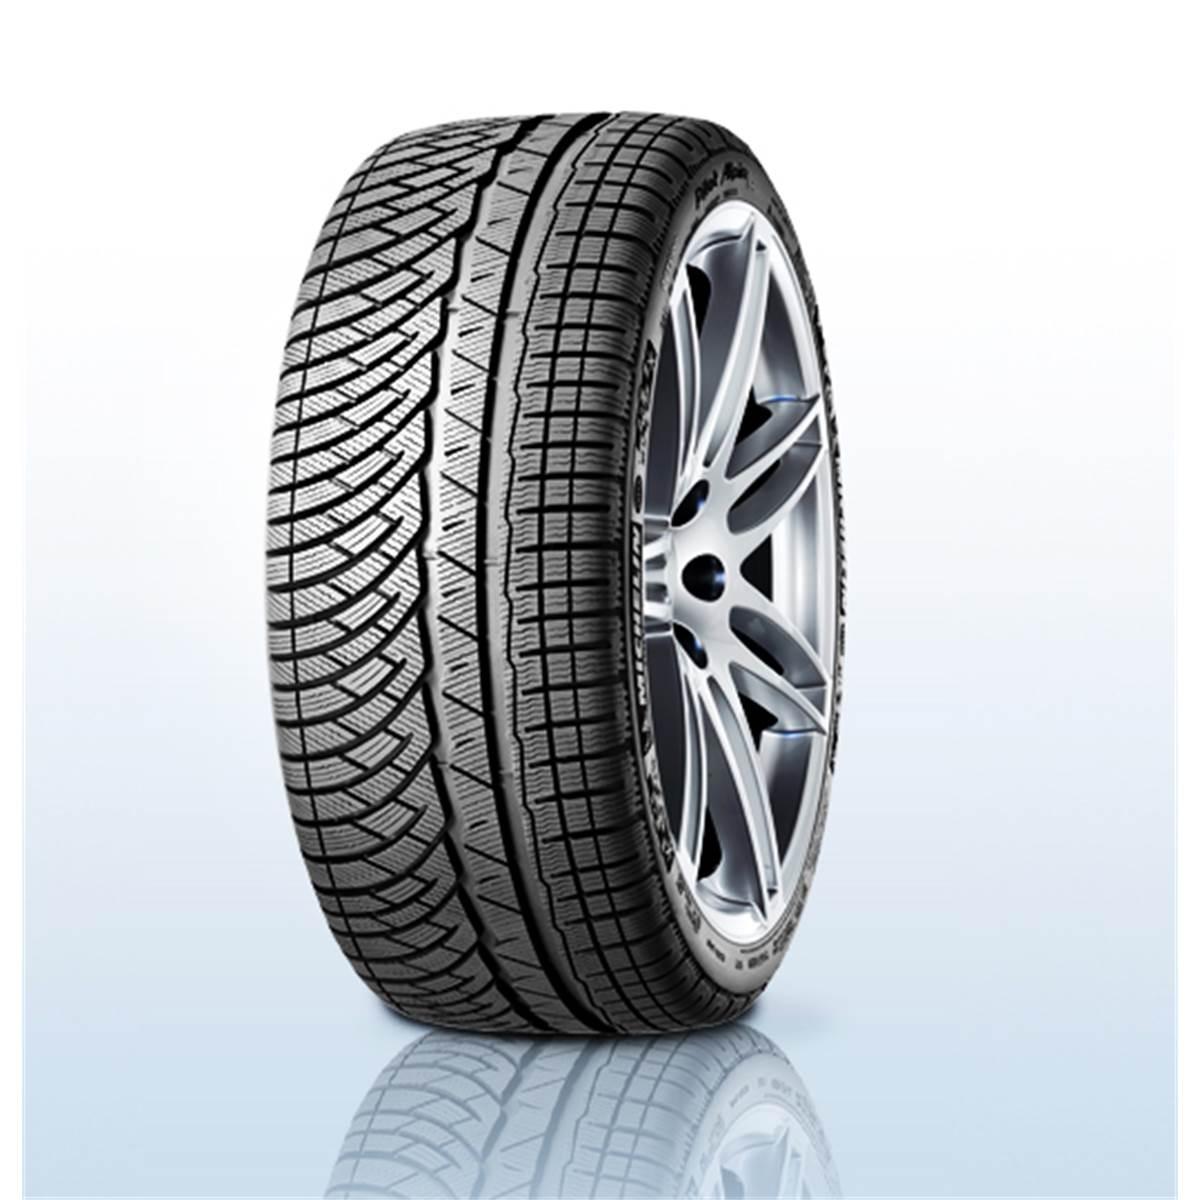 Pneu Hiver Michelin 255/40R18 99V Pilot Alpin Pa4 XL